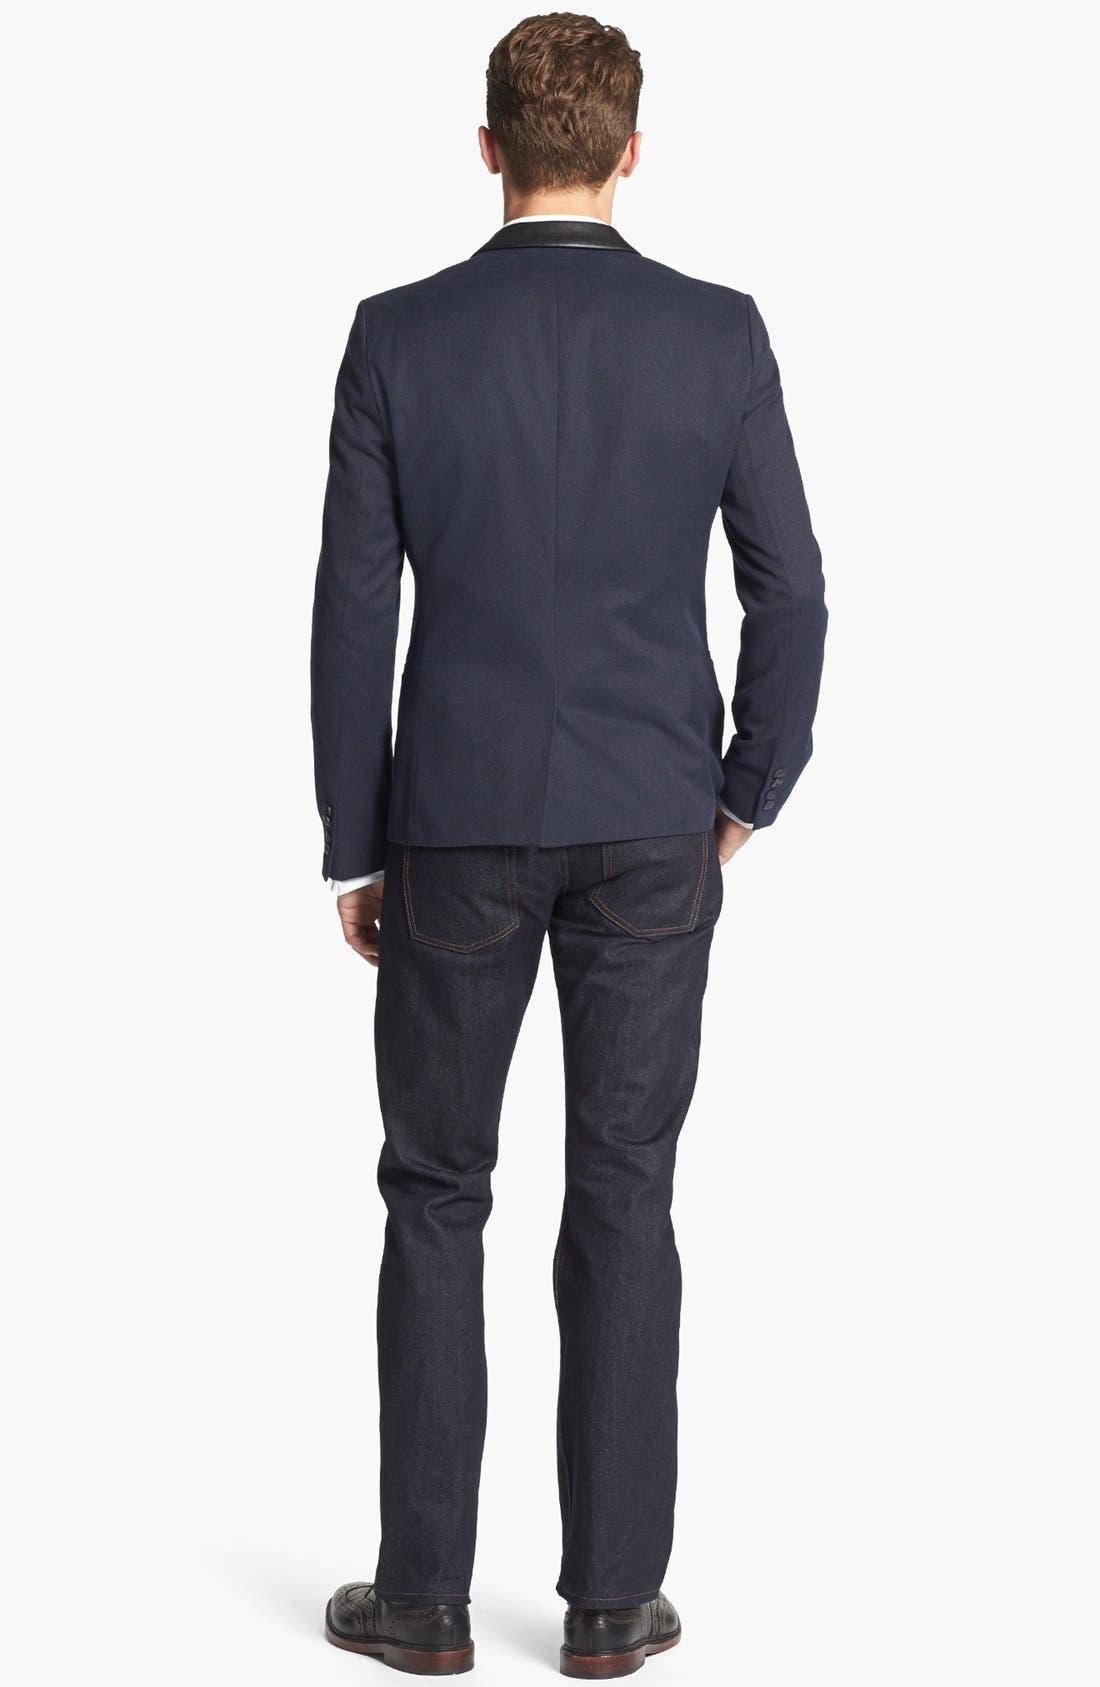 BOSS, Jameson Slim Fit Diamond Weave French Cuff Tuxedo Shirt, Alternate thumbnail 6, color, 120